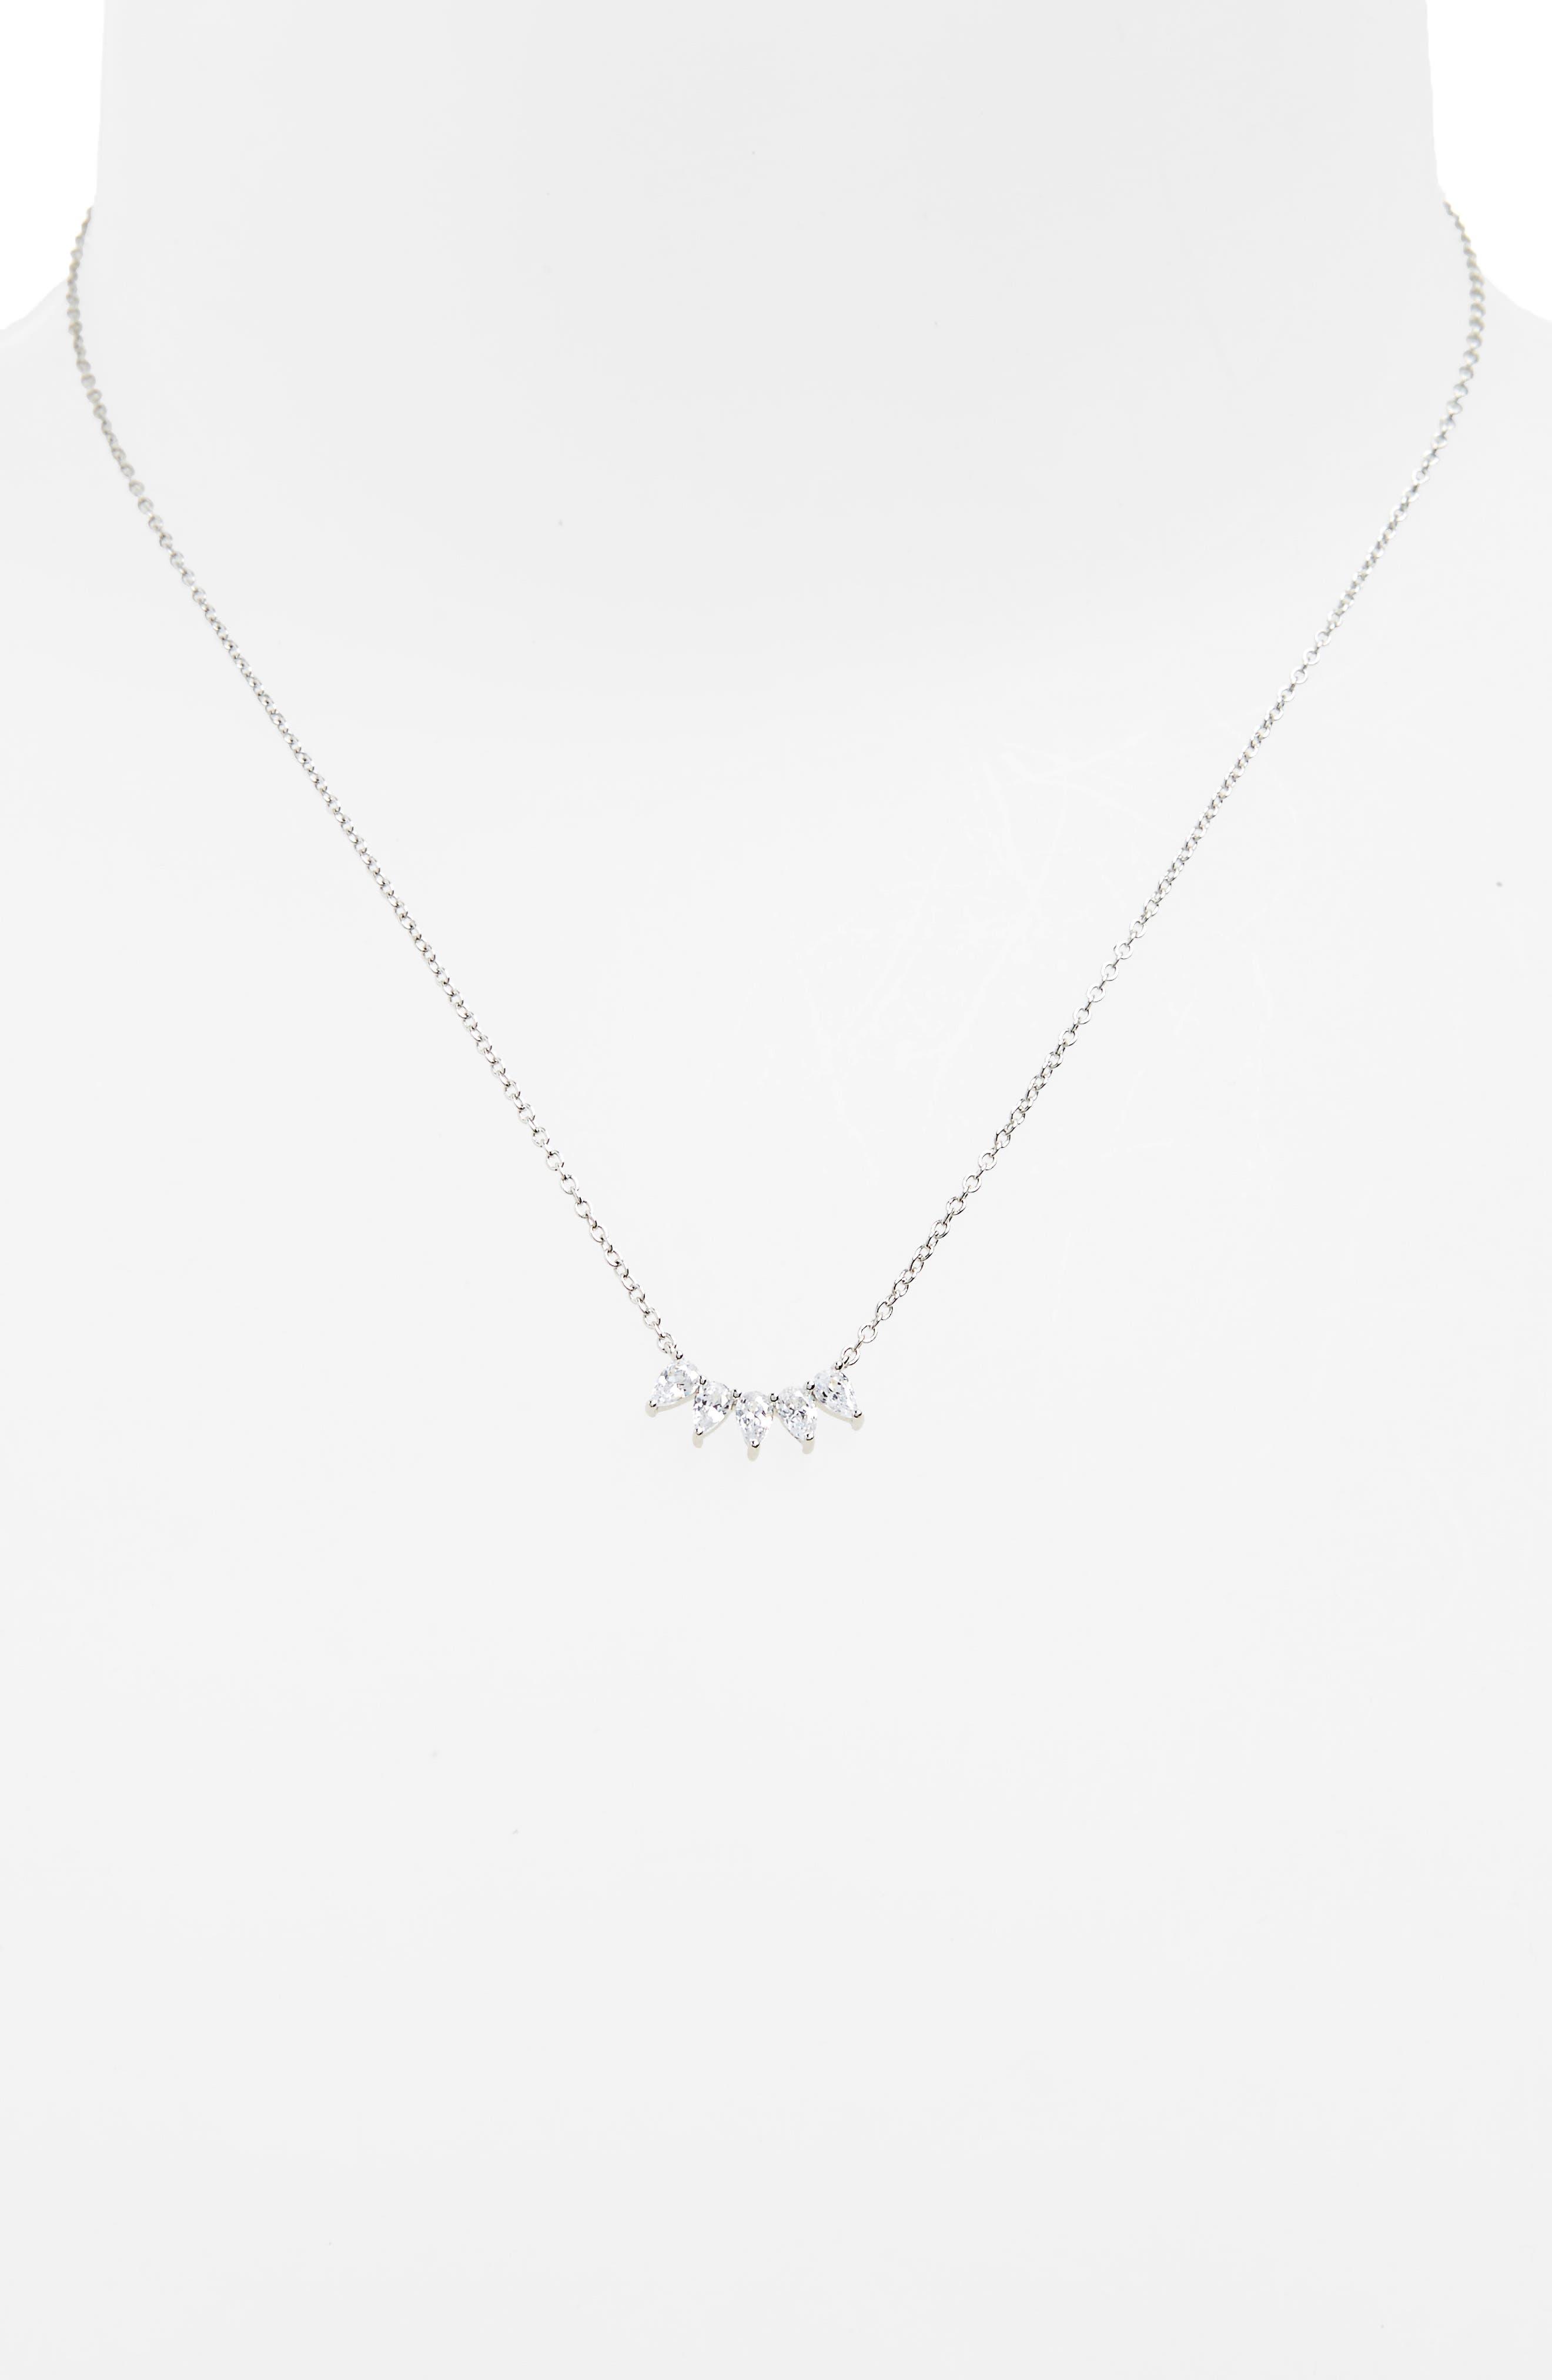 Marquise Cubic Zirconia Pendant Necklace,                             Alternate thumbnail 2, color,                             040